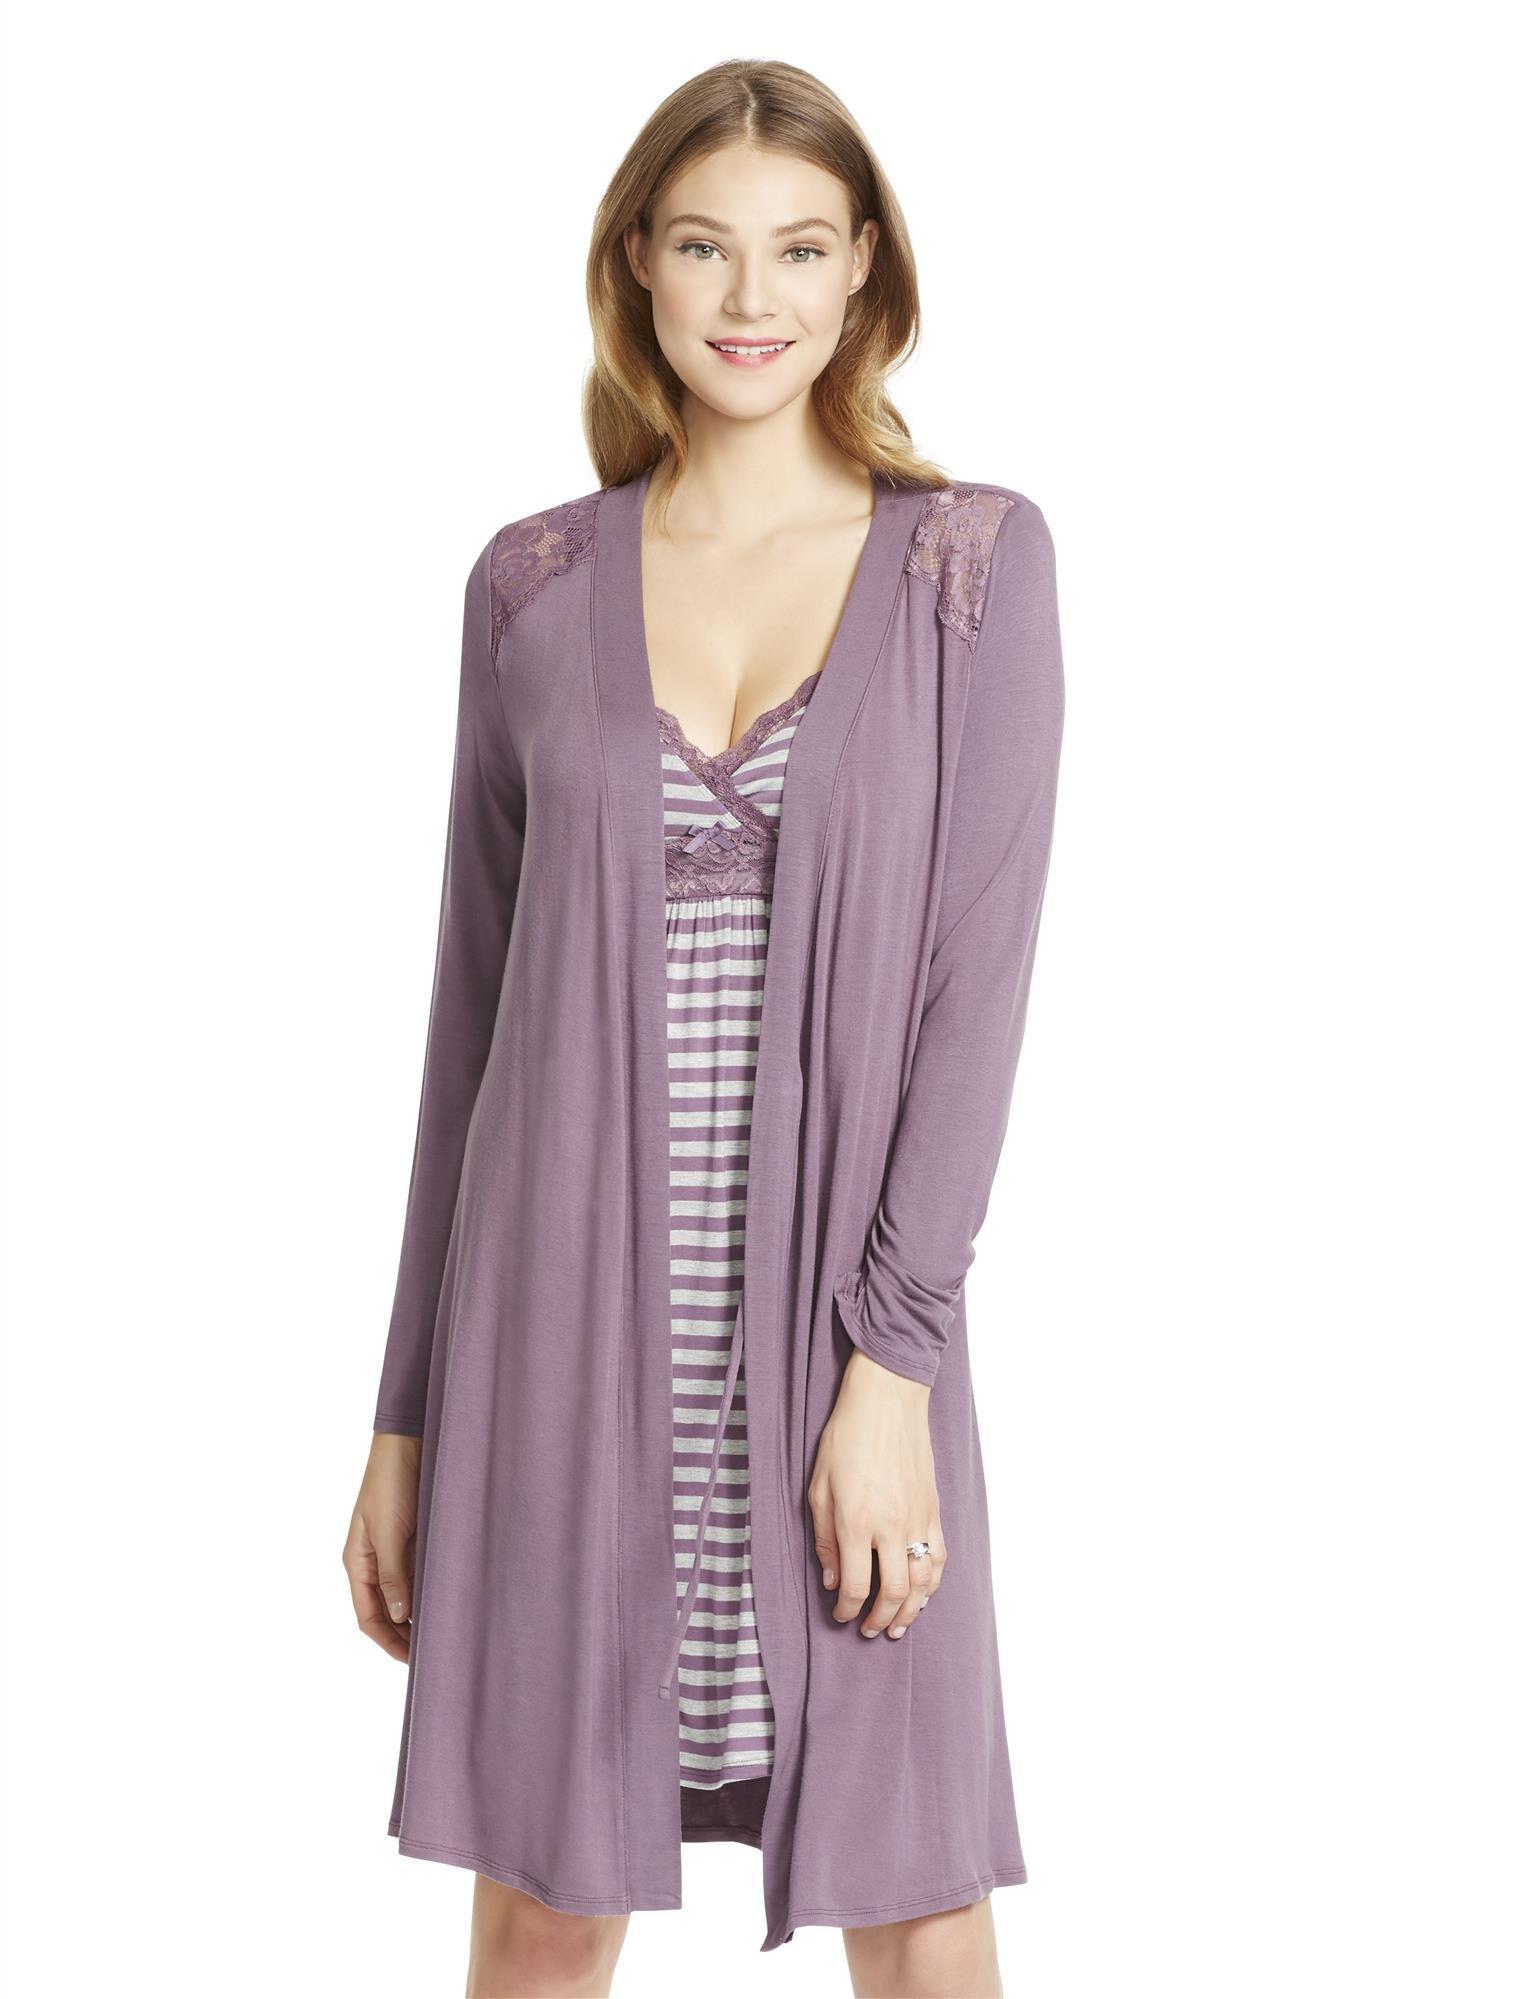 Jessica Simpson Lace Trim Maternity Robe- Pink